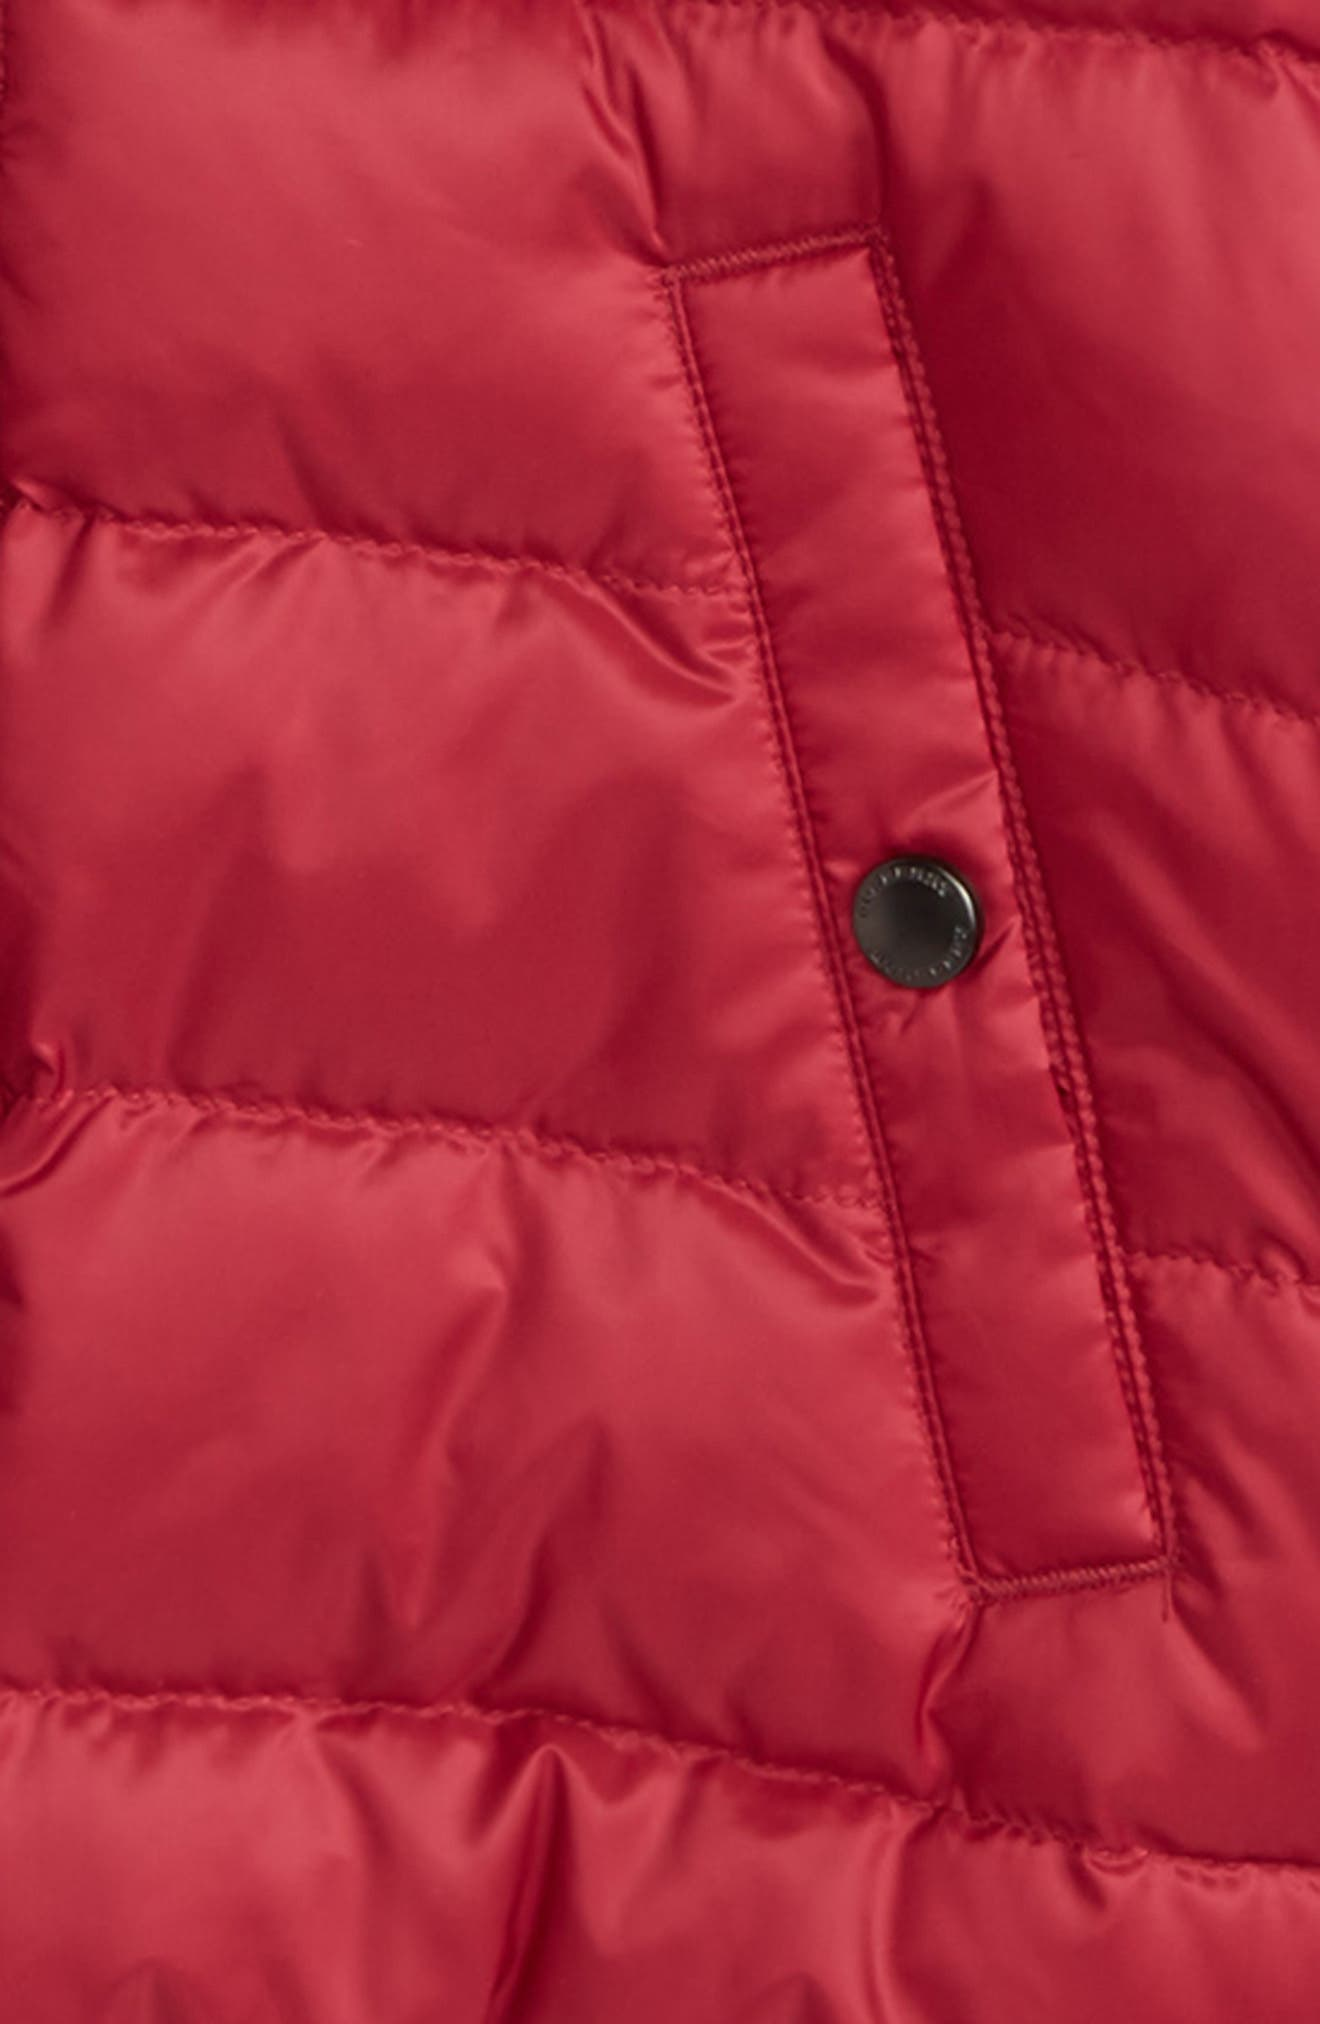 Mini Langleigh Reversible Down Jacket,                             Alternate thumbnail 4, color,                             655